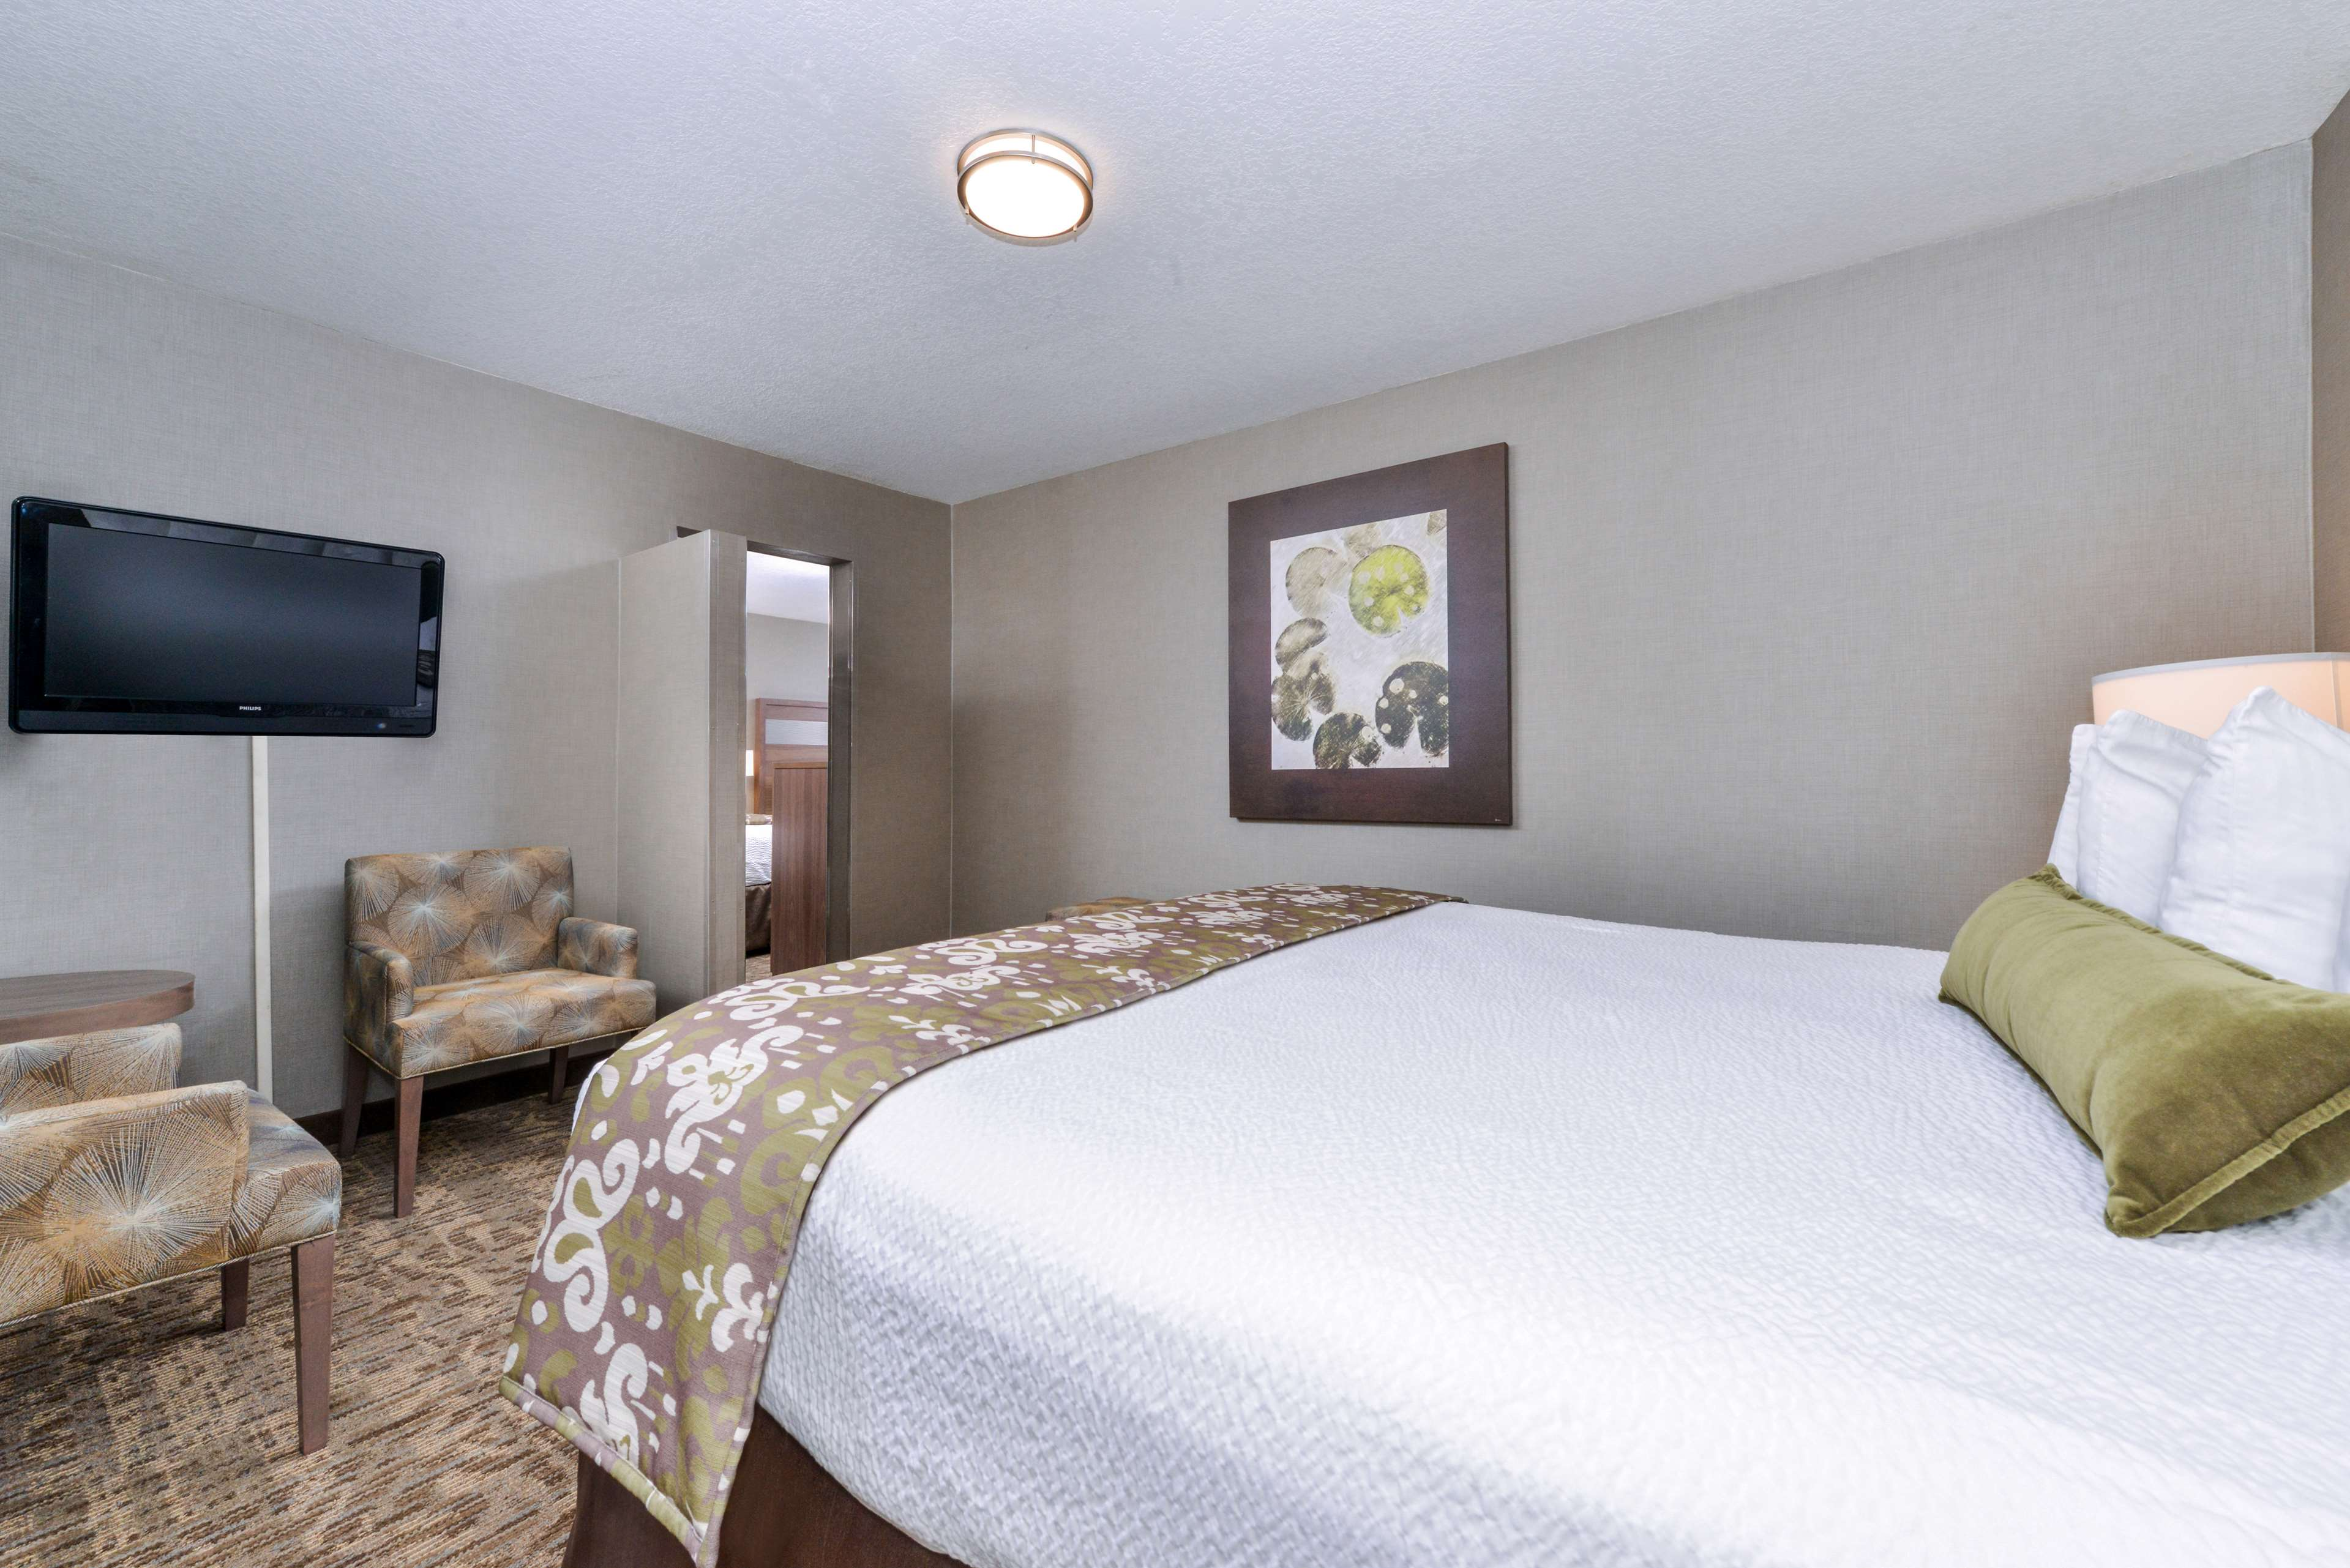 Hotels near Disneyland with Kitchen | Residence Inn